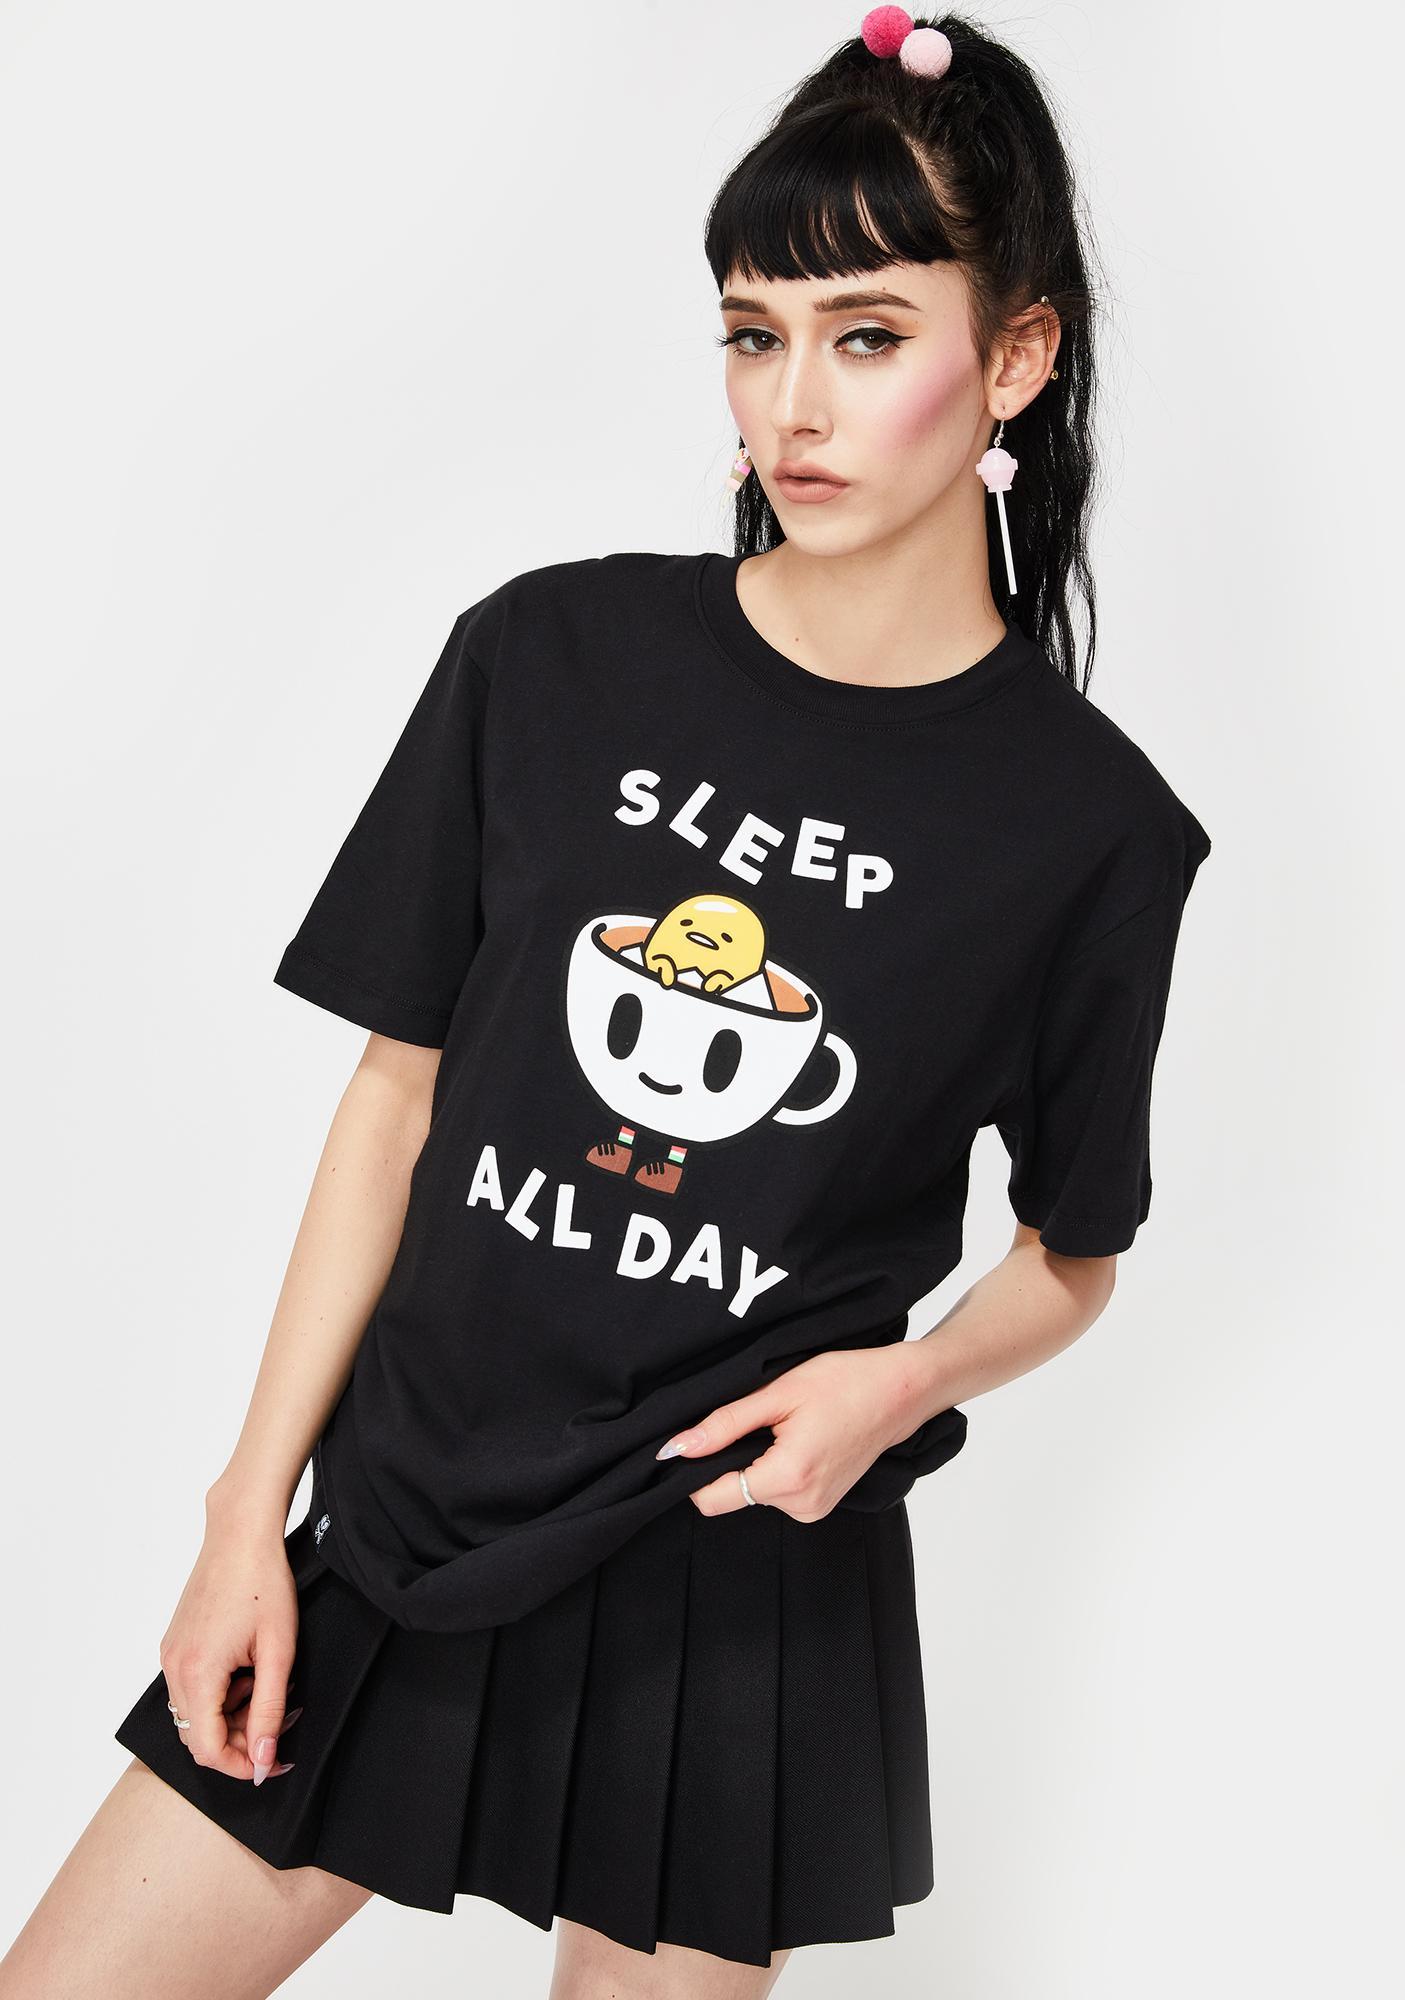 Tokidoki X Gudetama Sleep All Day Graphic Tee